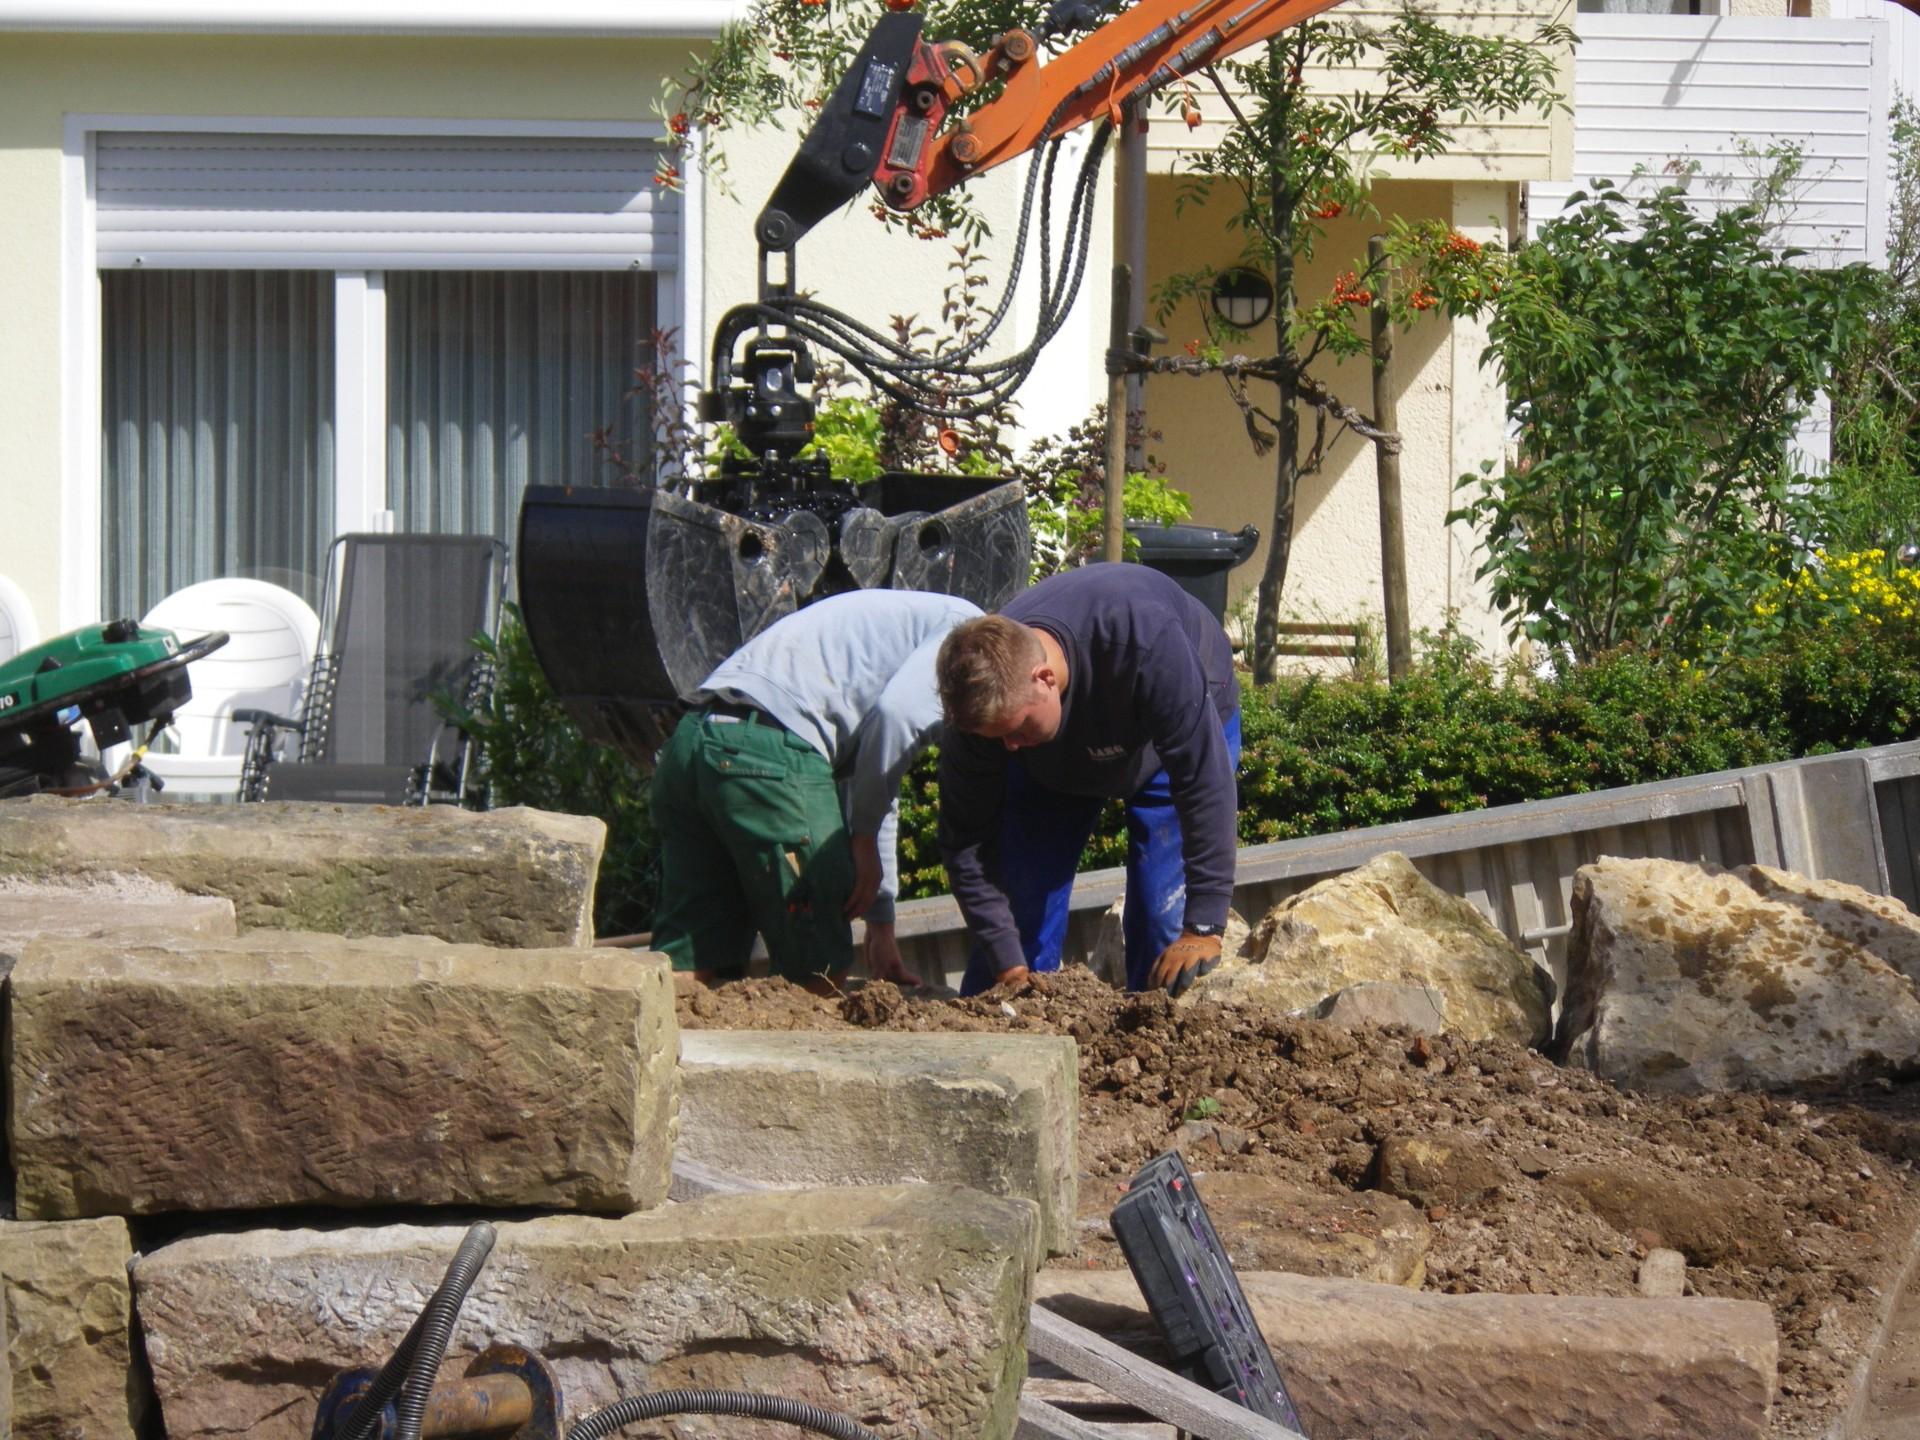 G seehaus e v for Garten landschaftsbau